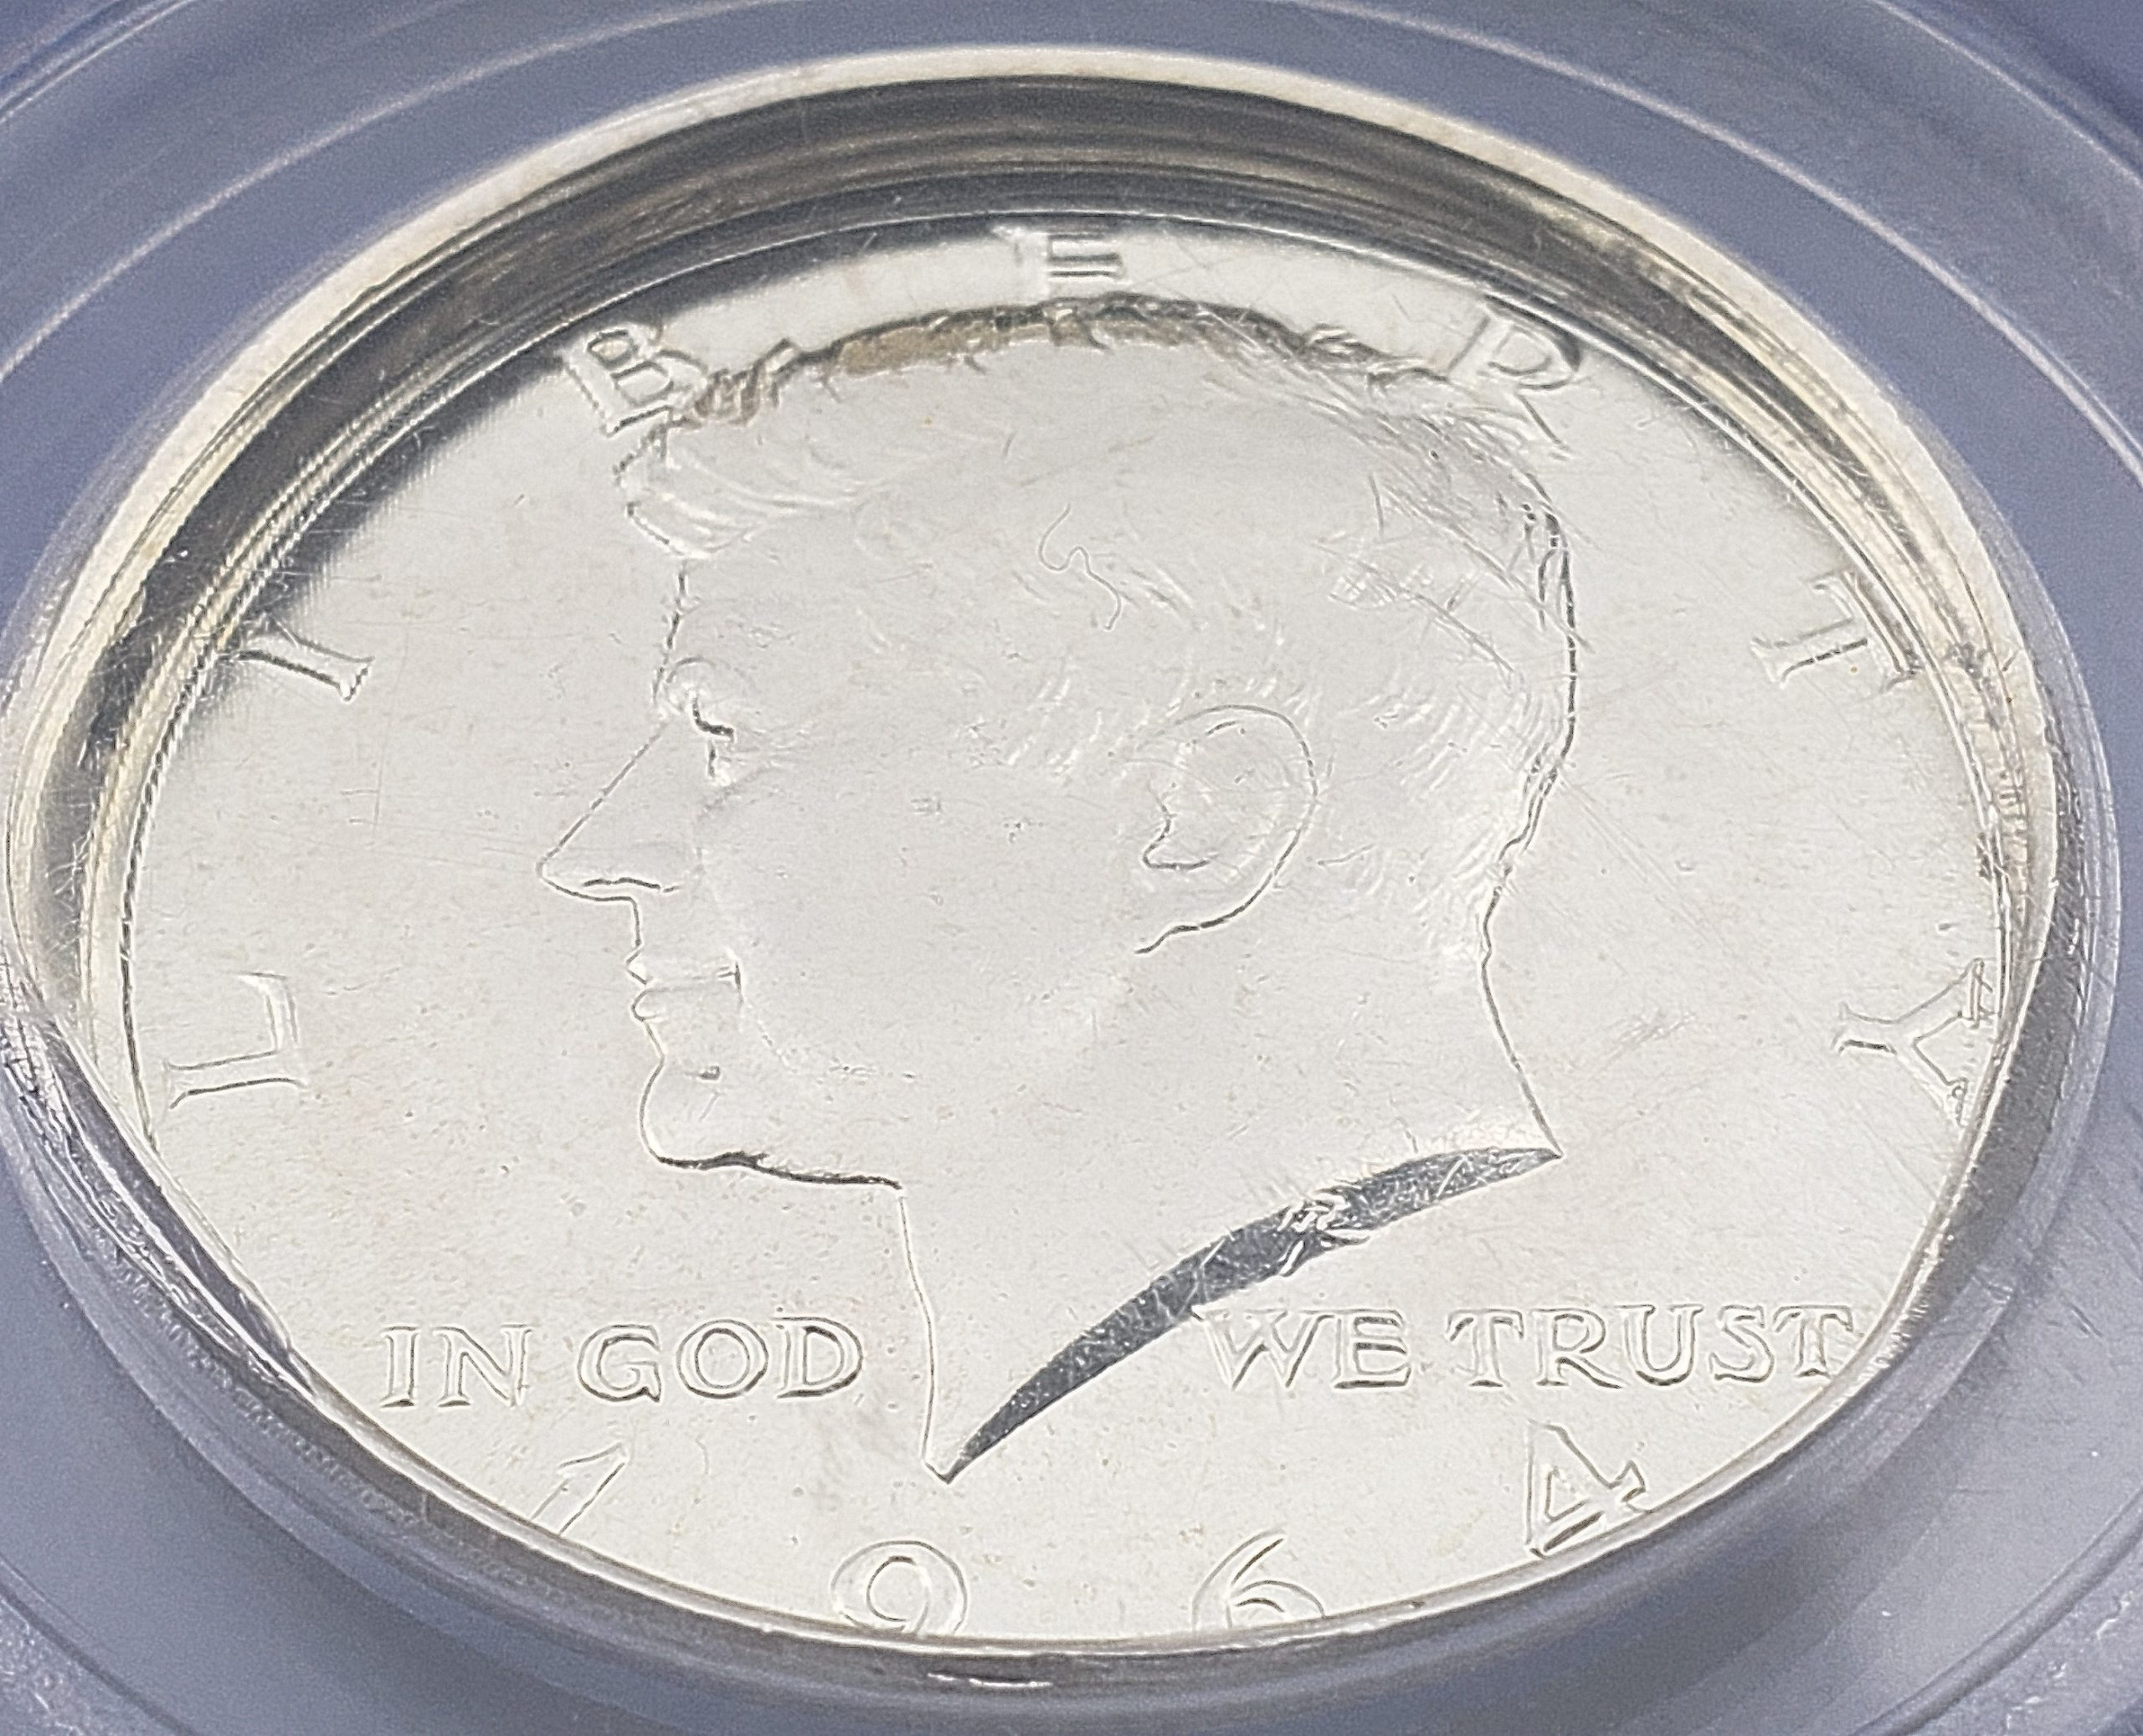 Amazing 1964 Kennedy Deep Die Cap major mint error coin!